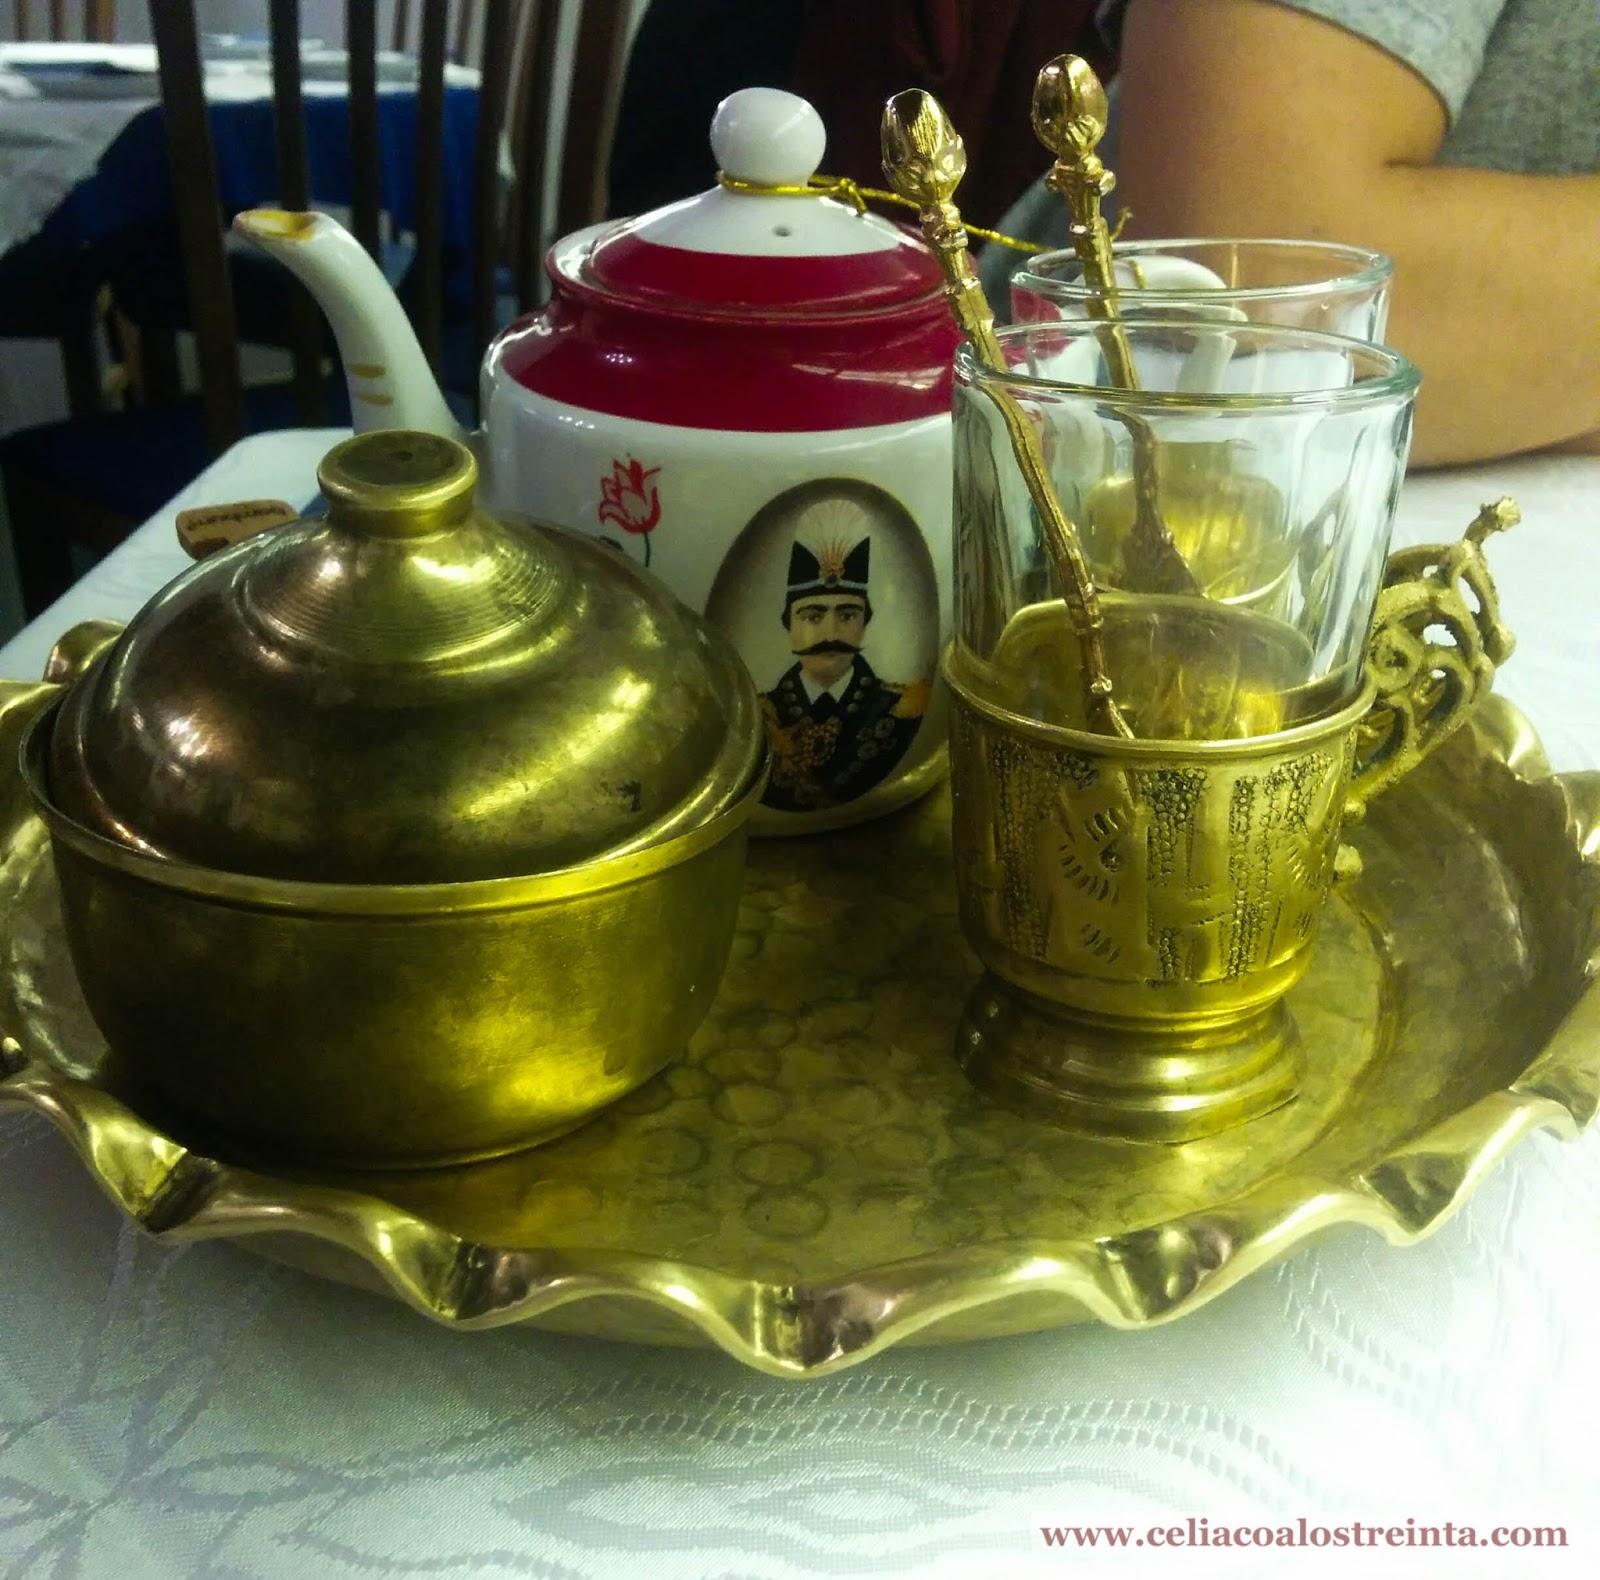 Restaurante Persa - Iraní Sin Gluten en Alcobendas